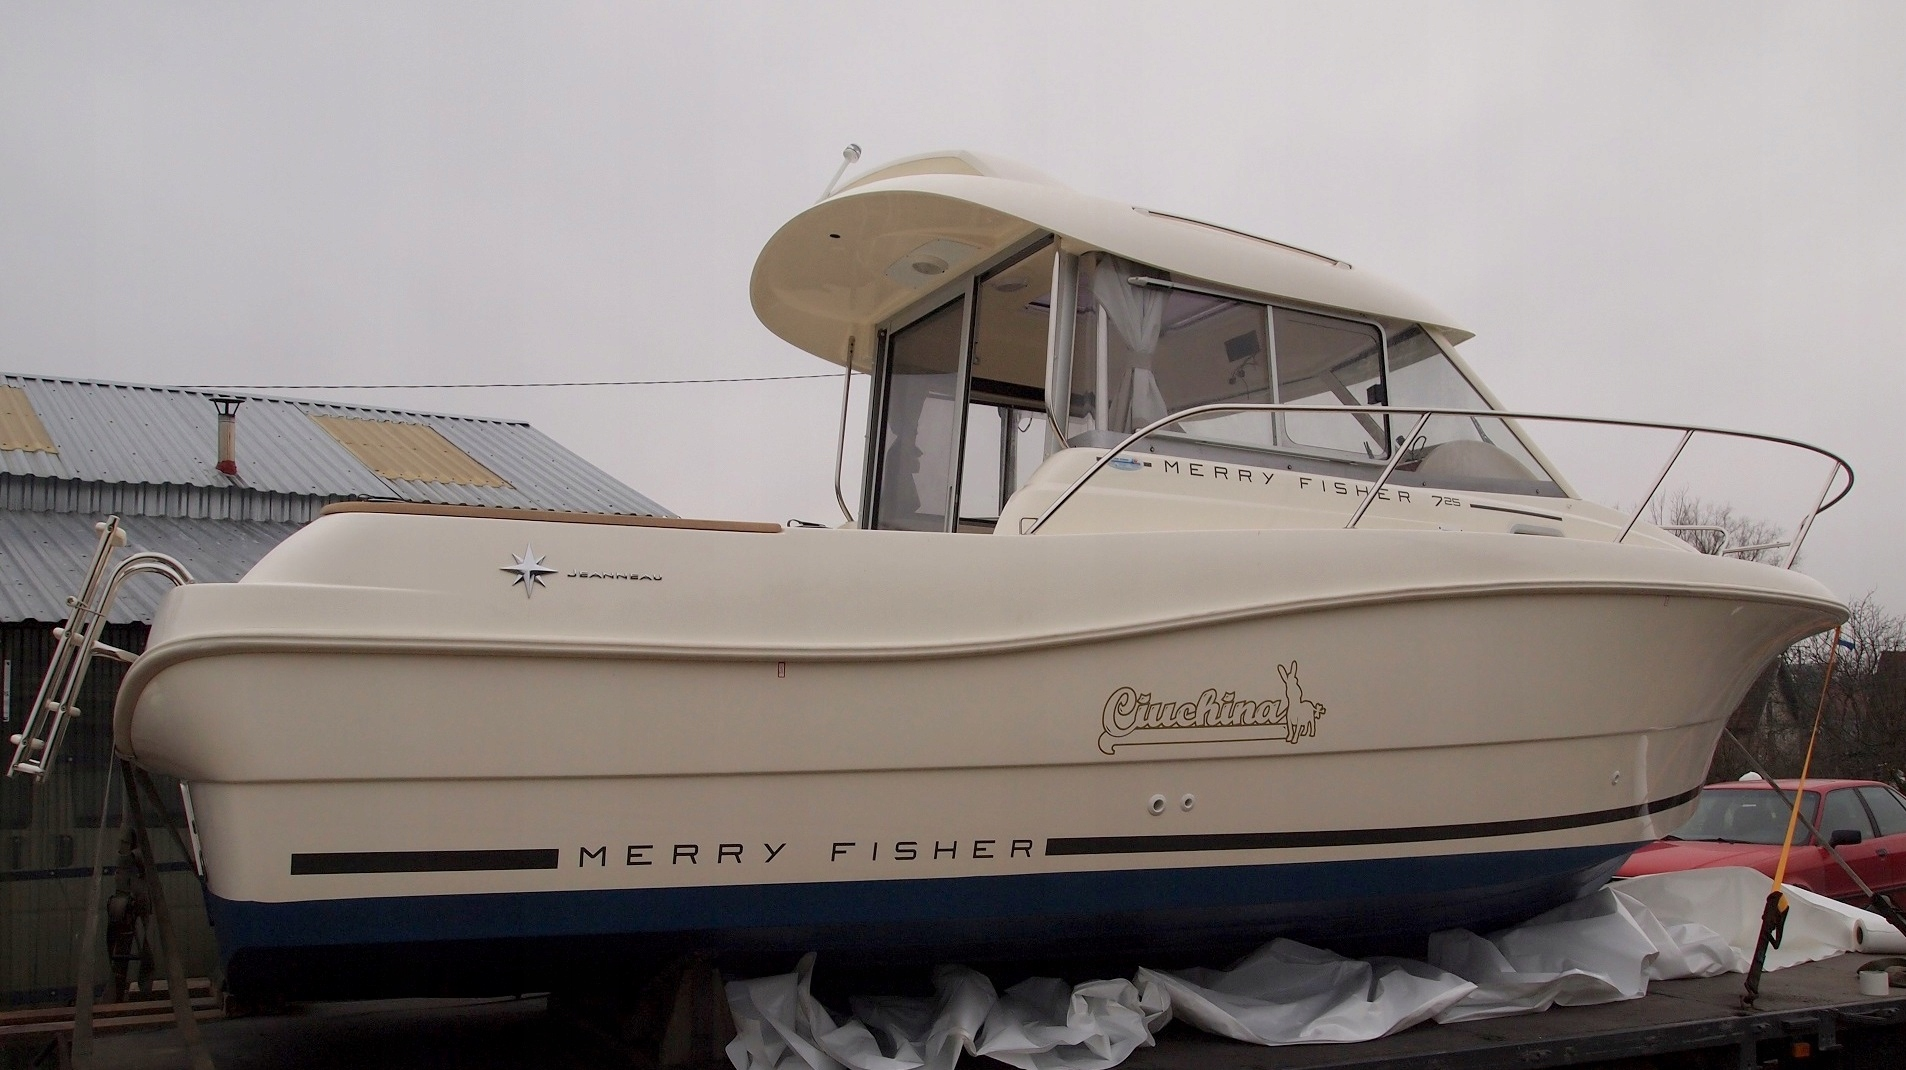 ŁÓDŹ Merry Fisher 725 OKAZJA!